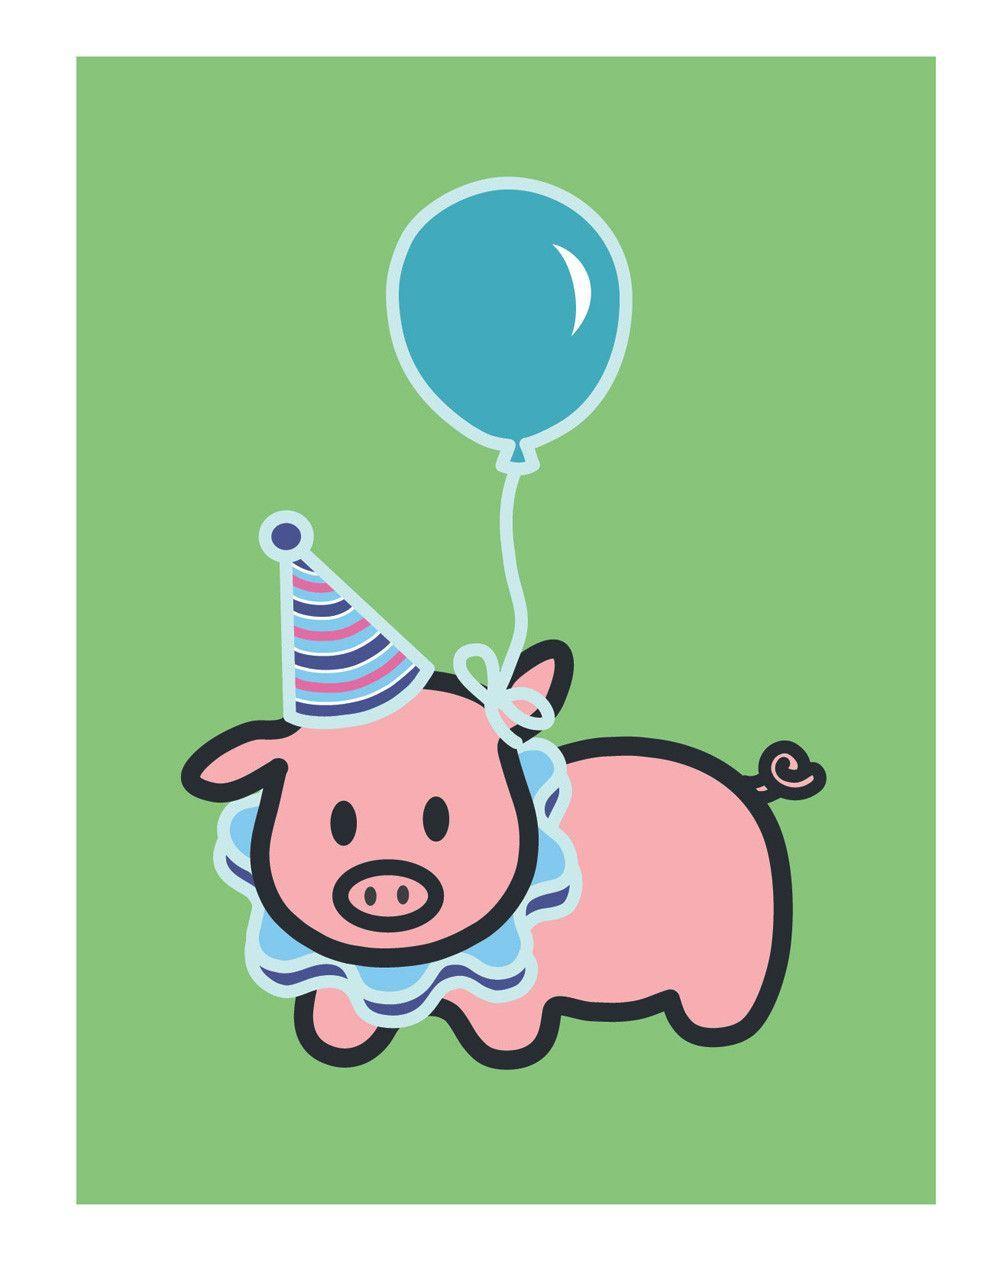 Pig Birthday Card Pig Birthday Happy Birthday Wishes Cards Homemade Birthday Cards